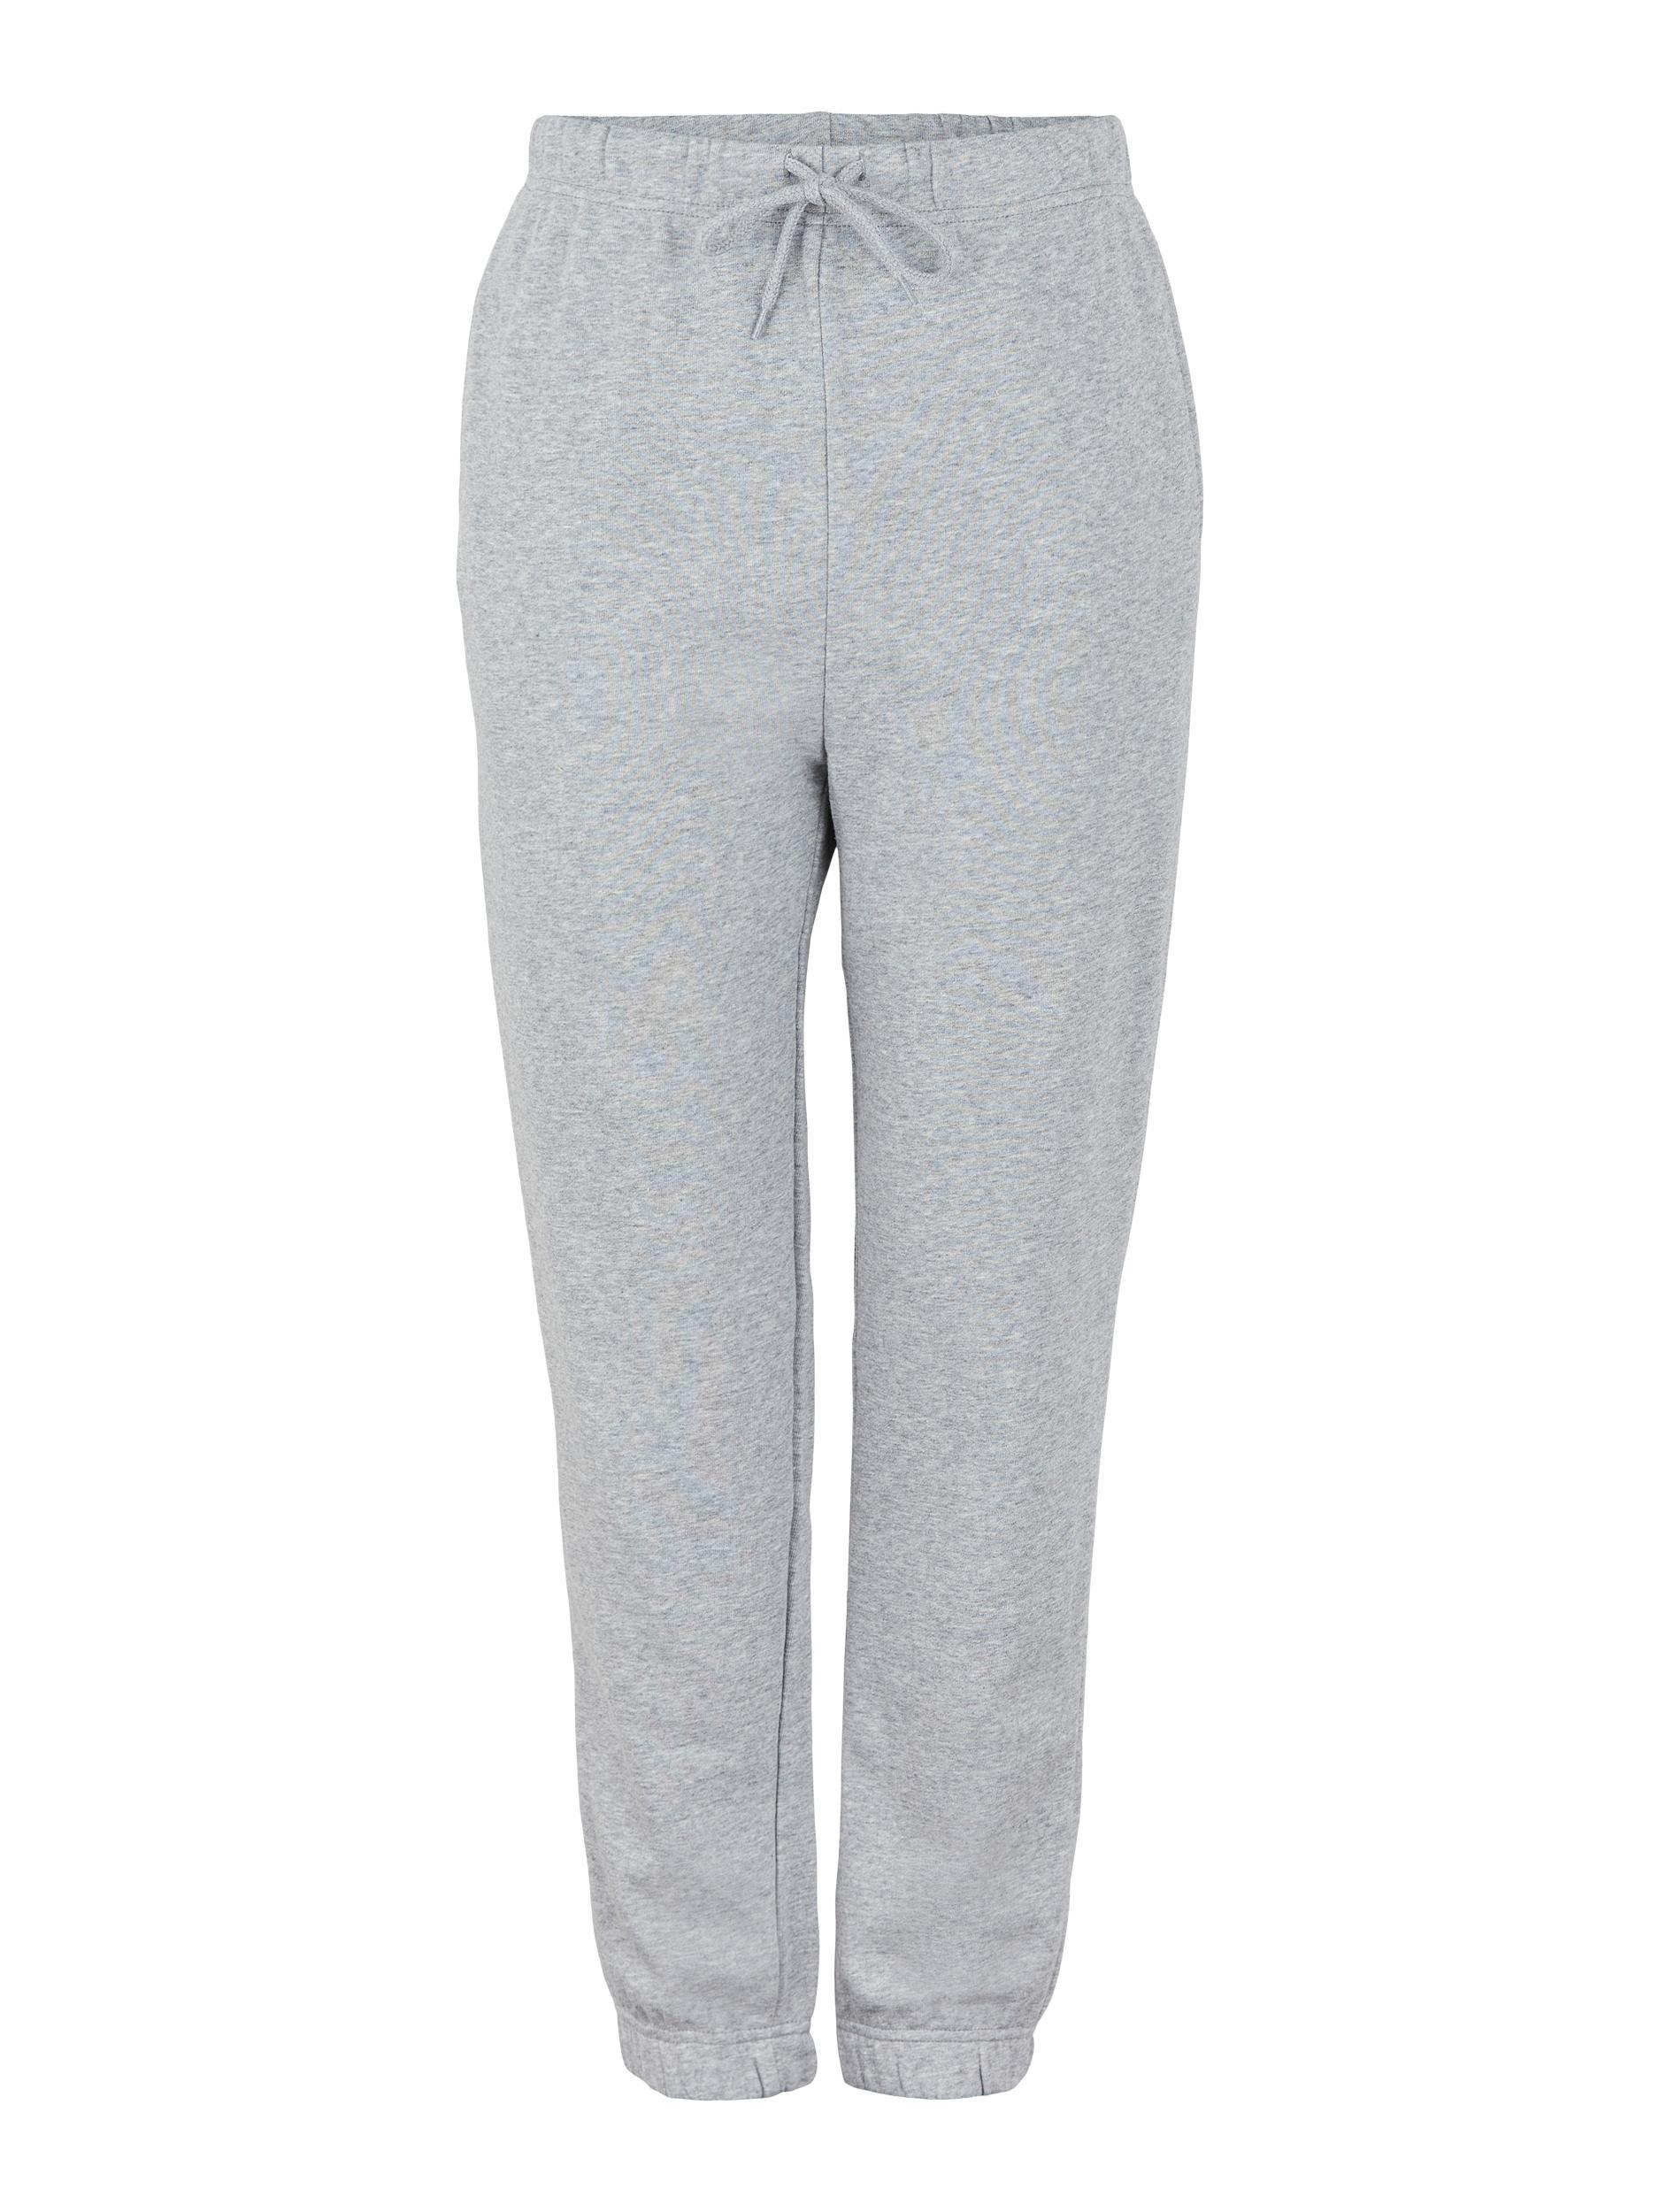 Pieces Chilli Summer HW sweatpants, light grey melange, medium